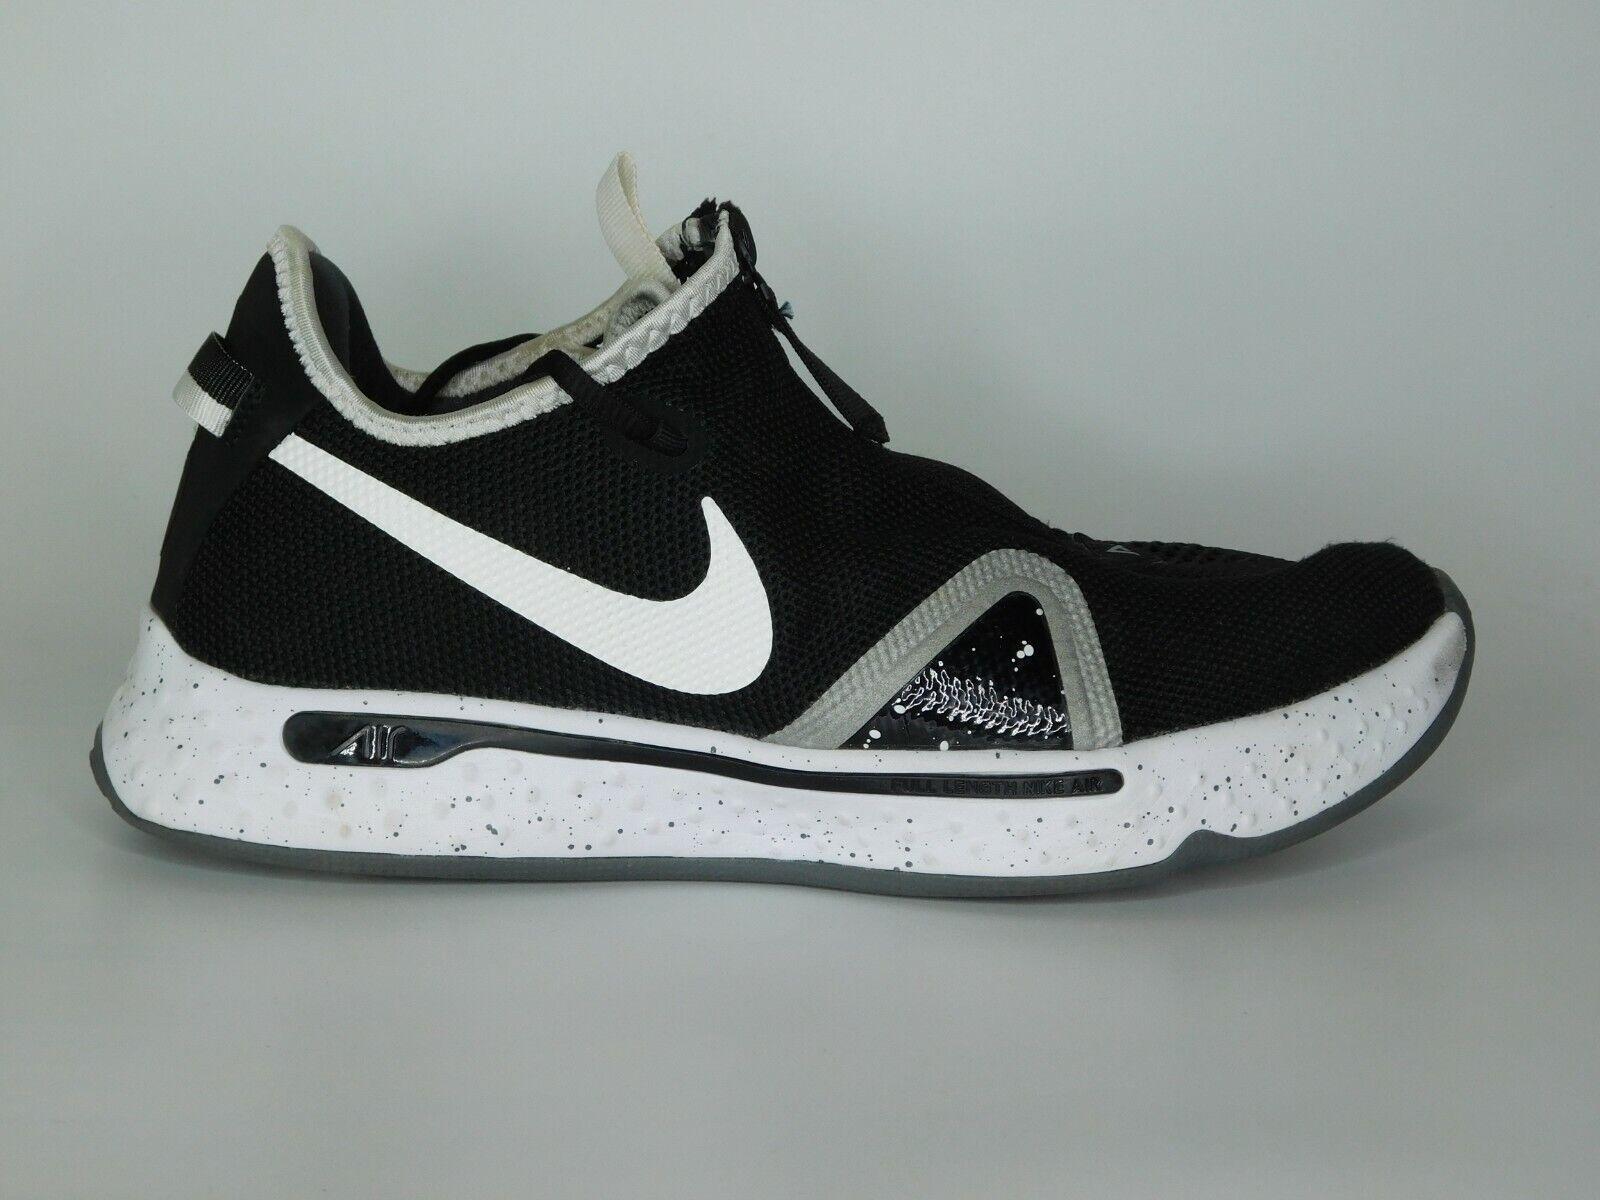 Nike PG4 Paul George Basketball Shoes Black And White US Size 9.5 CK5828-002 on eBay thumbnail